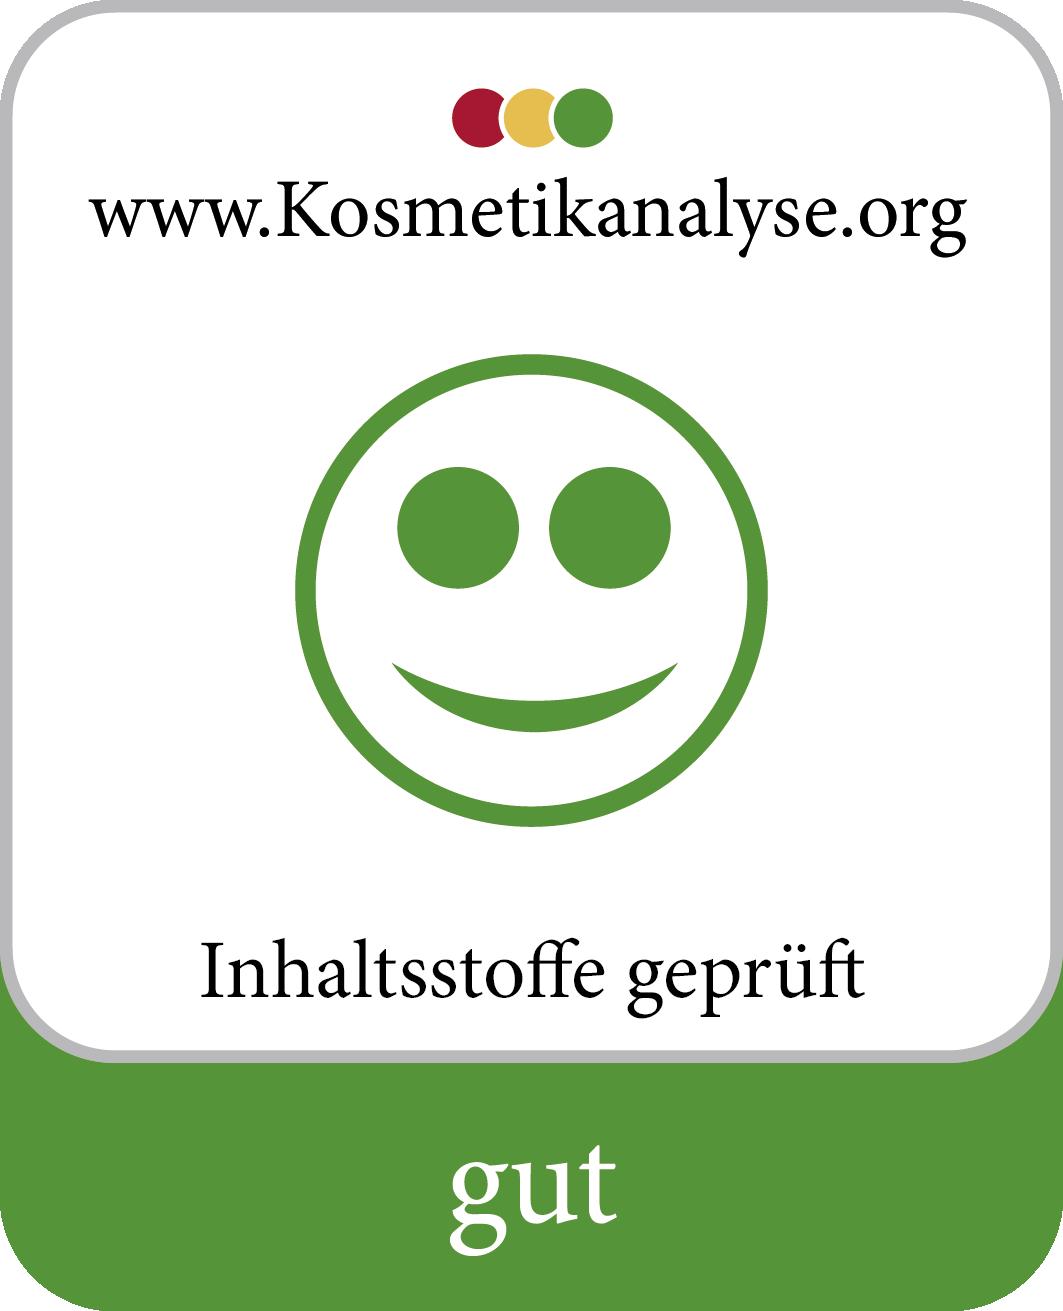 kosmetikanalyse-v08-DE-sehrgut.png